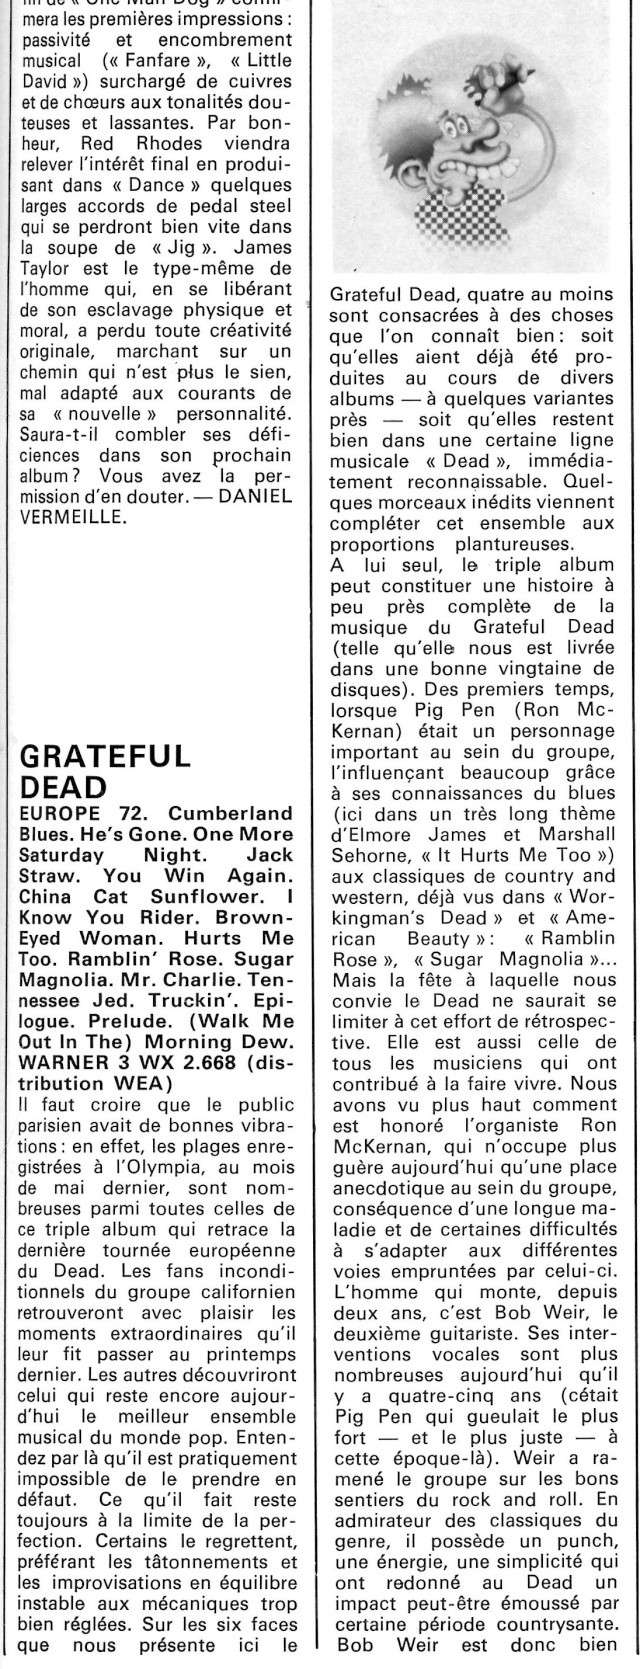 Grateful Dead - Europe '72 (1972) R_72-615